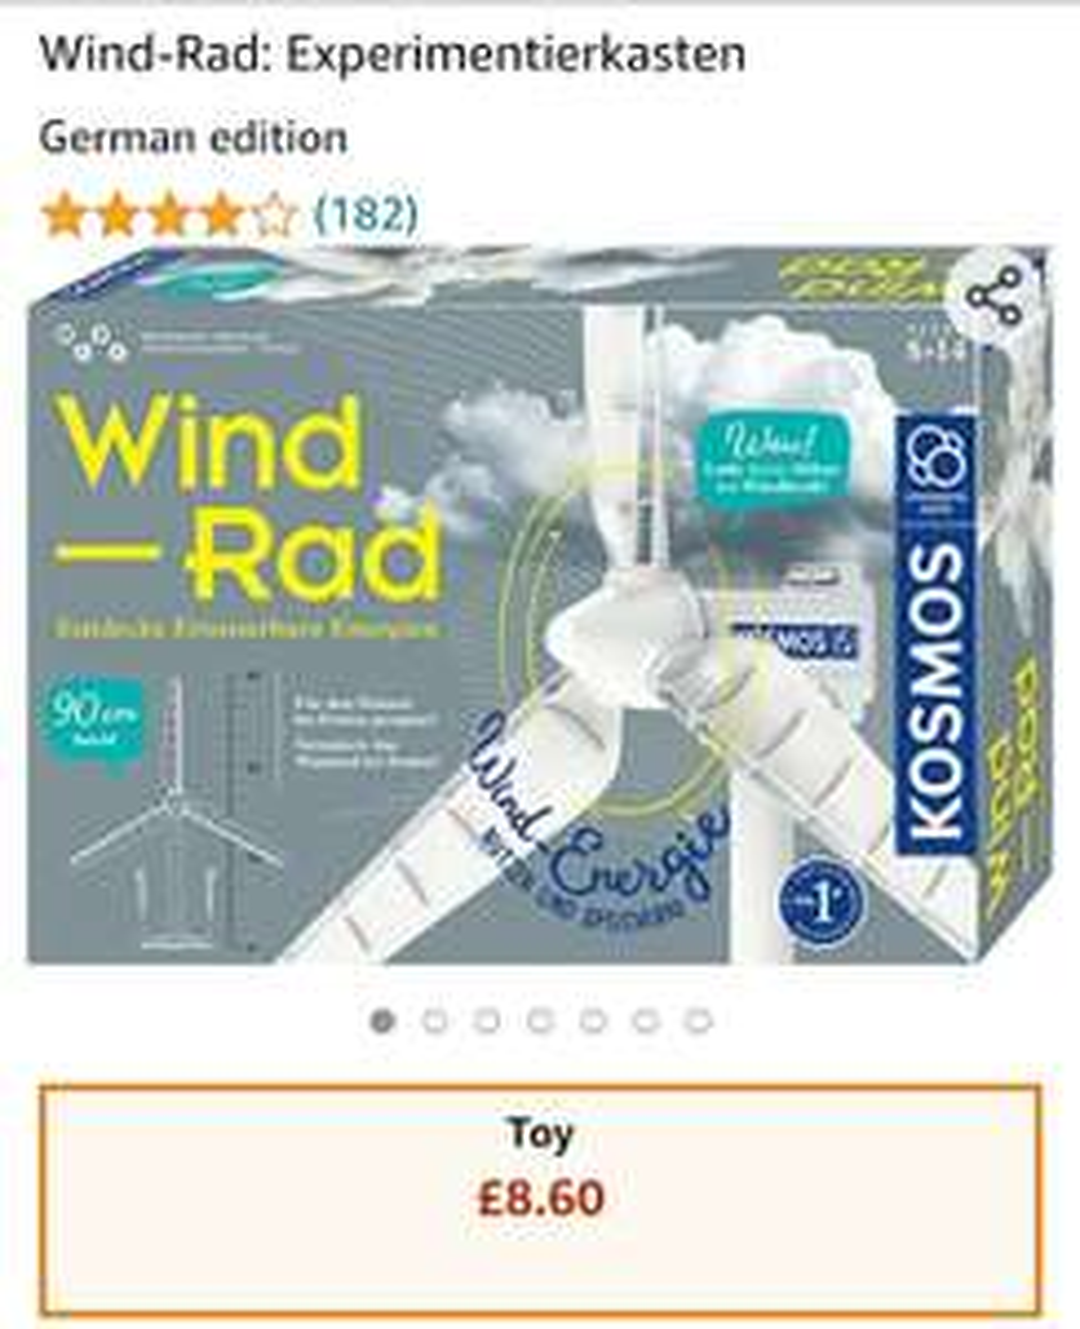 Wind-Rad: Experimentierkasten